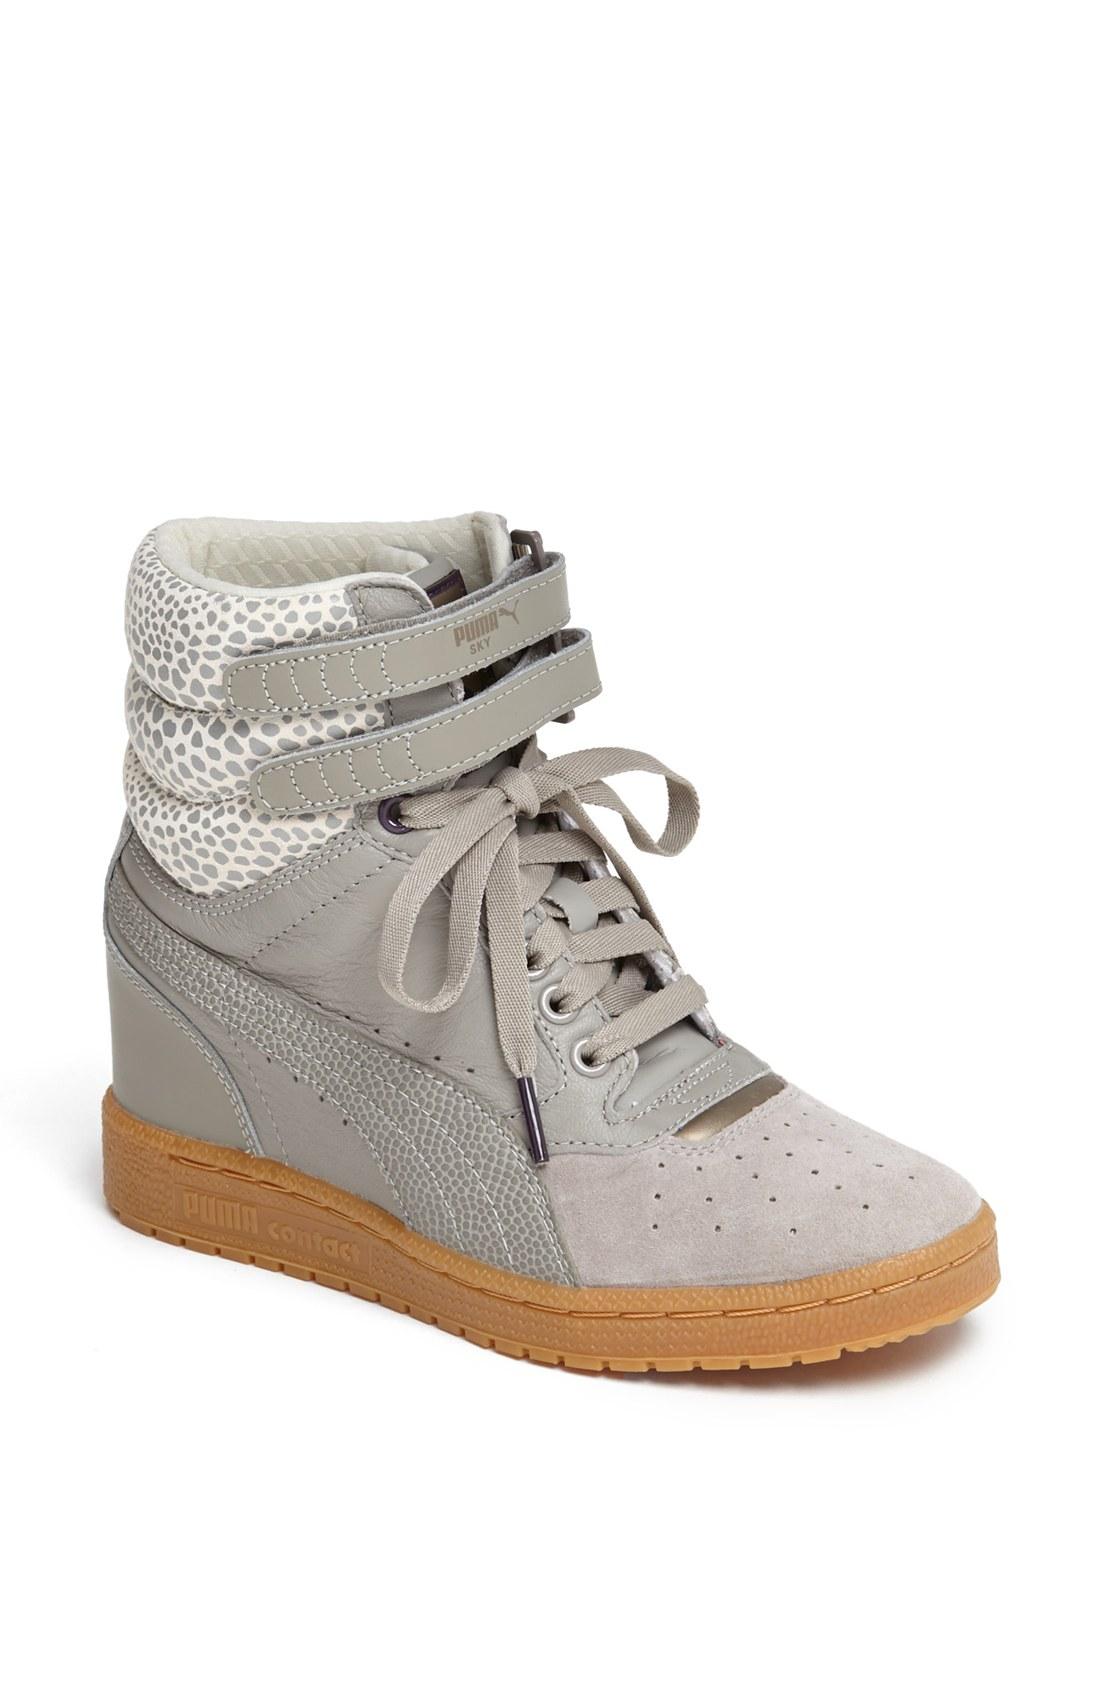 Puma Sky Wedge Sneaker in Gray (Elephant  Winter White)  6e92d1a01